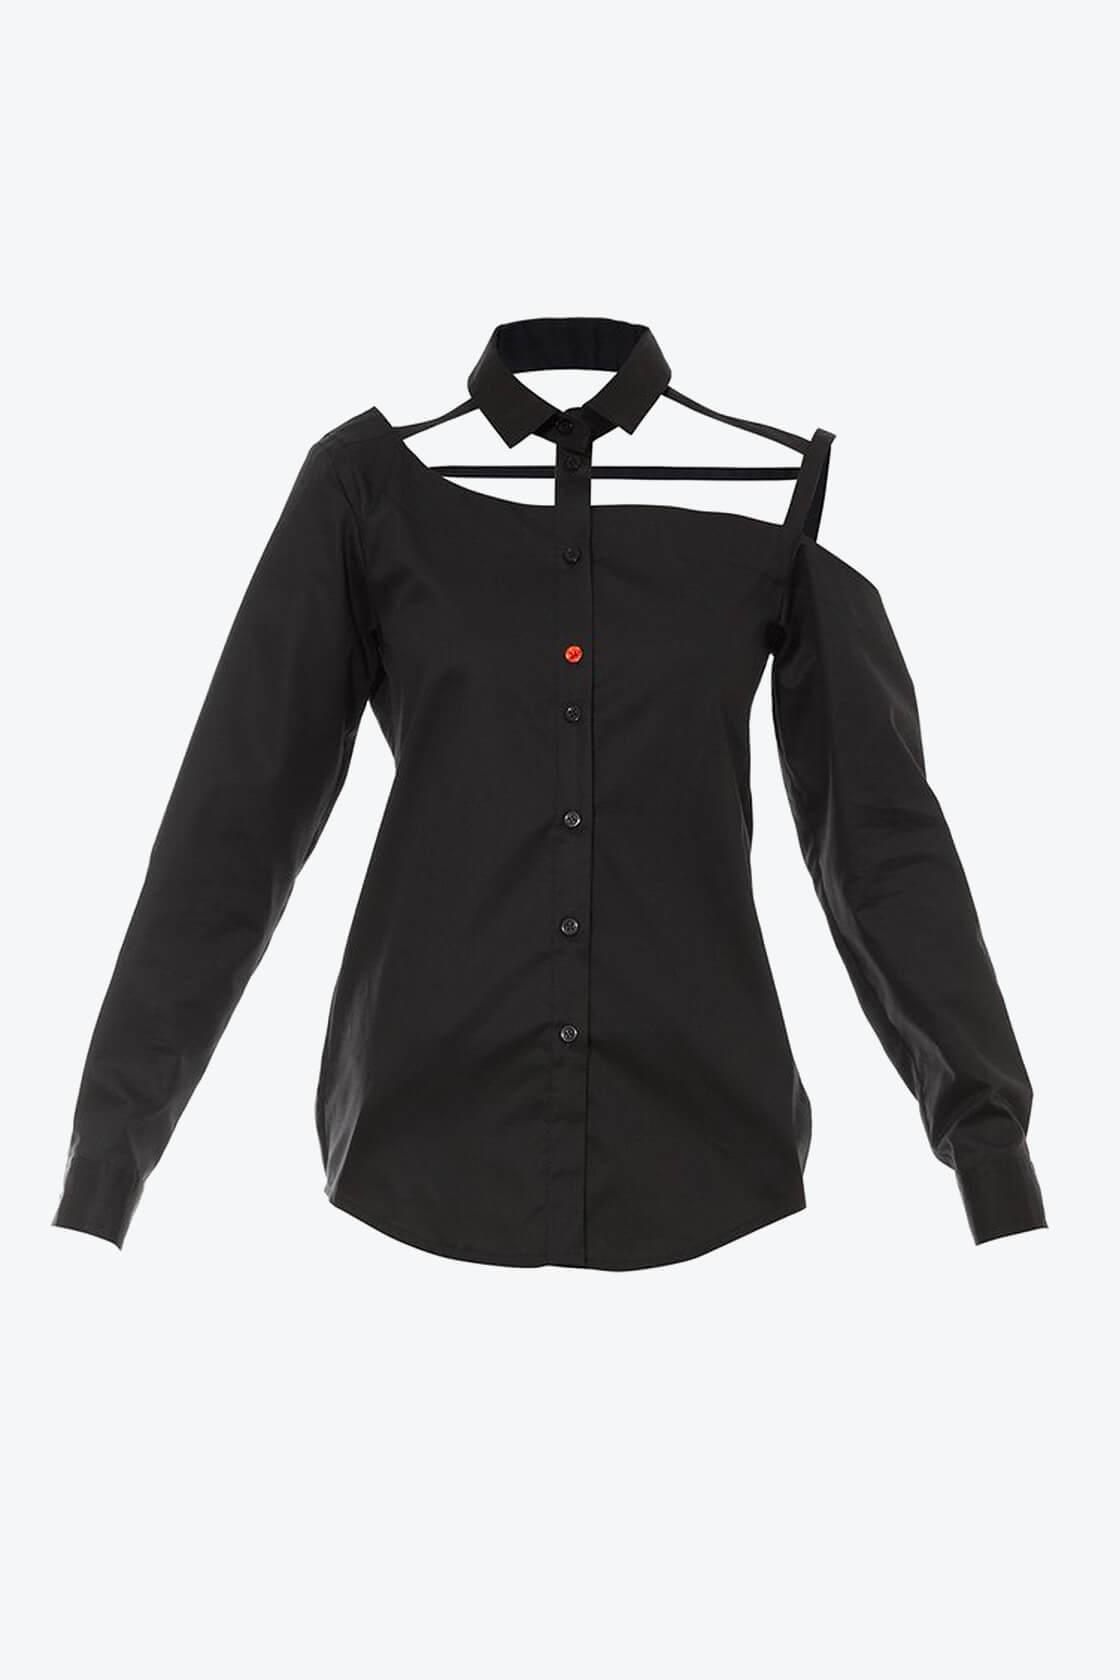 OL10000191 One shoulder button down blouse black1